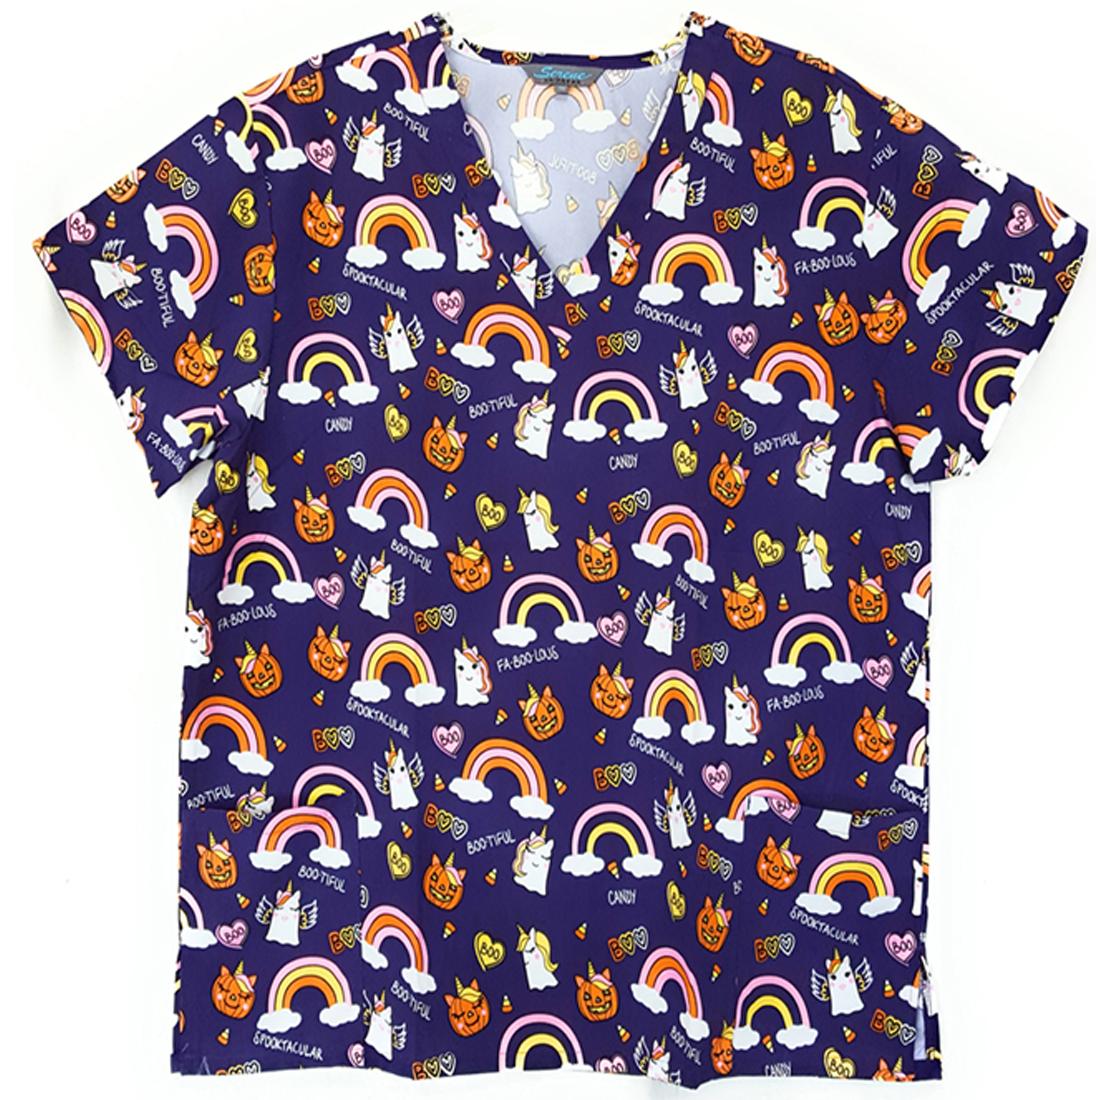 V-Neck-Halloween-Print-Scrub-Top-Microfiber-Medical-Uniform-Shirt-DSF-Uniforms miniature 22